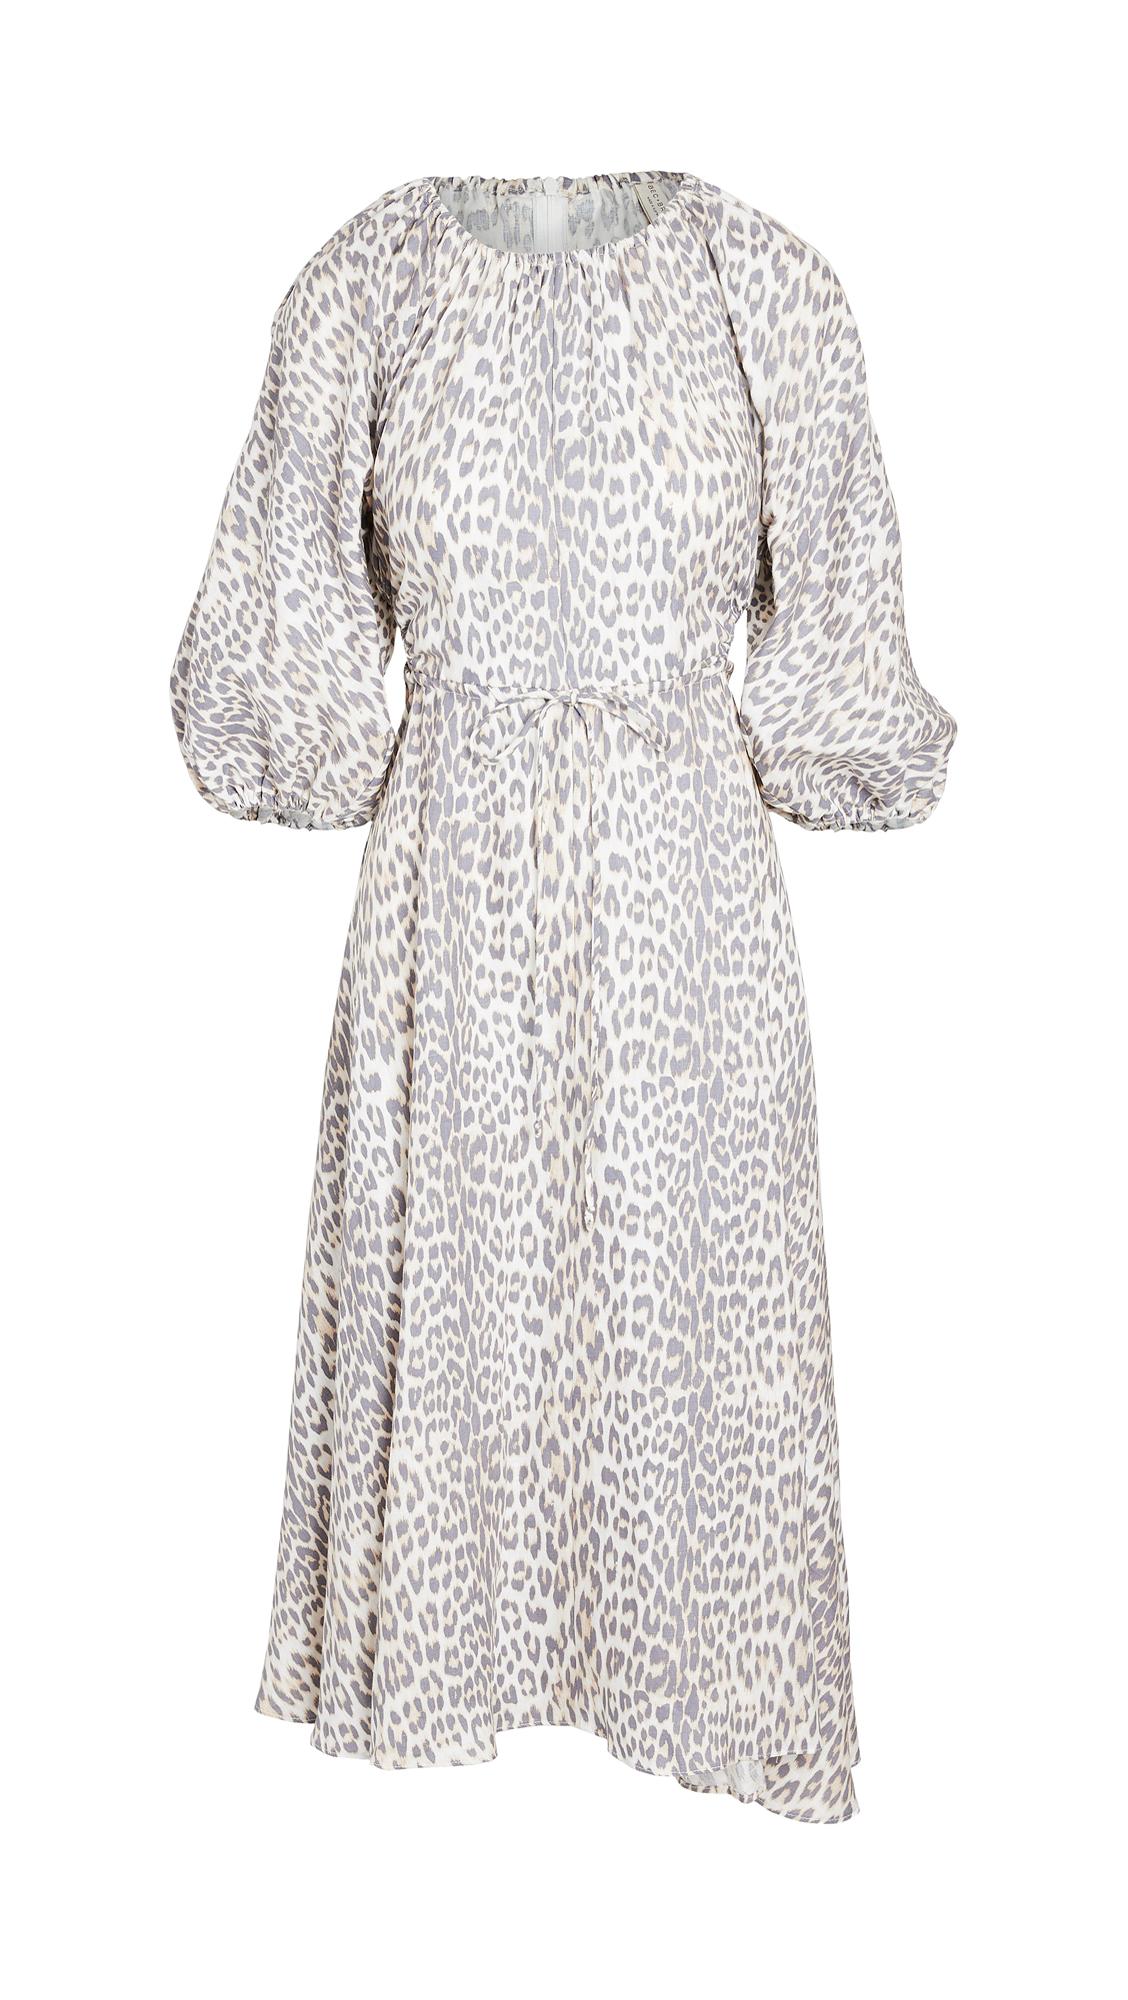 Bec & Bridge Ocelot Midi Dress